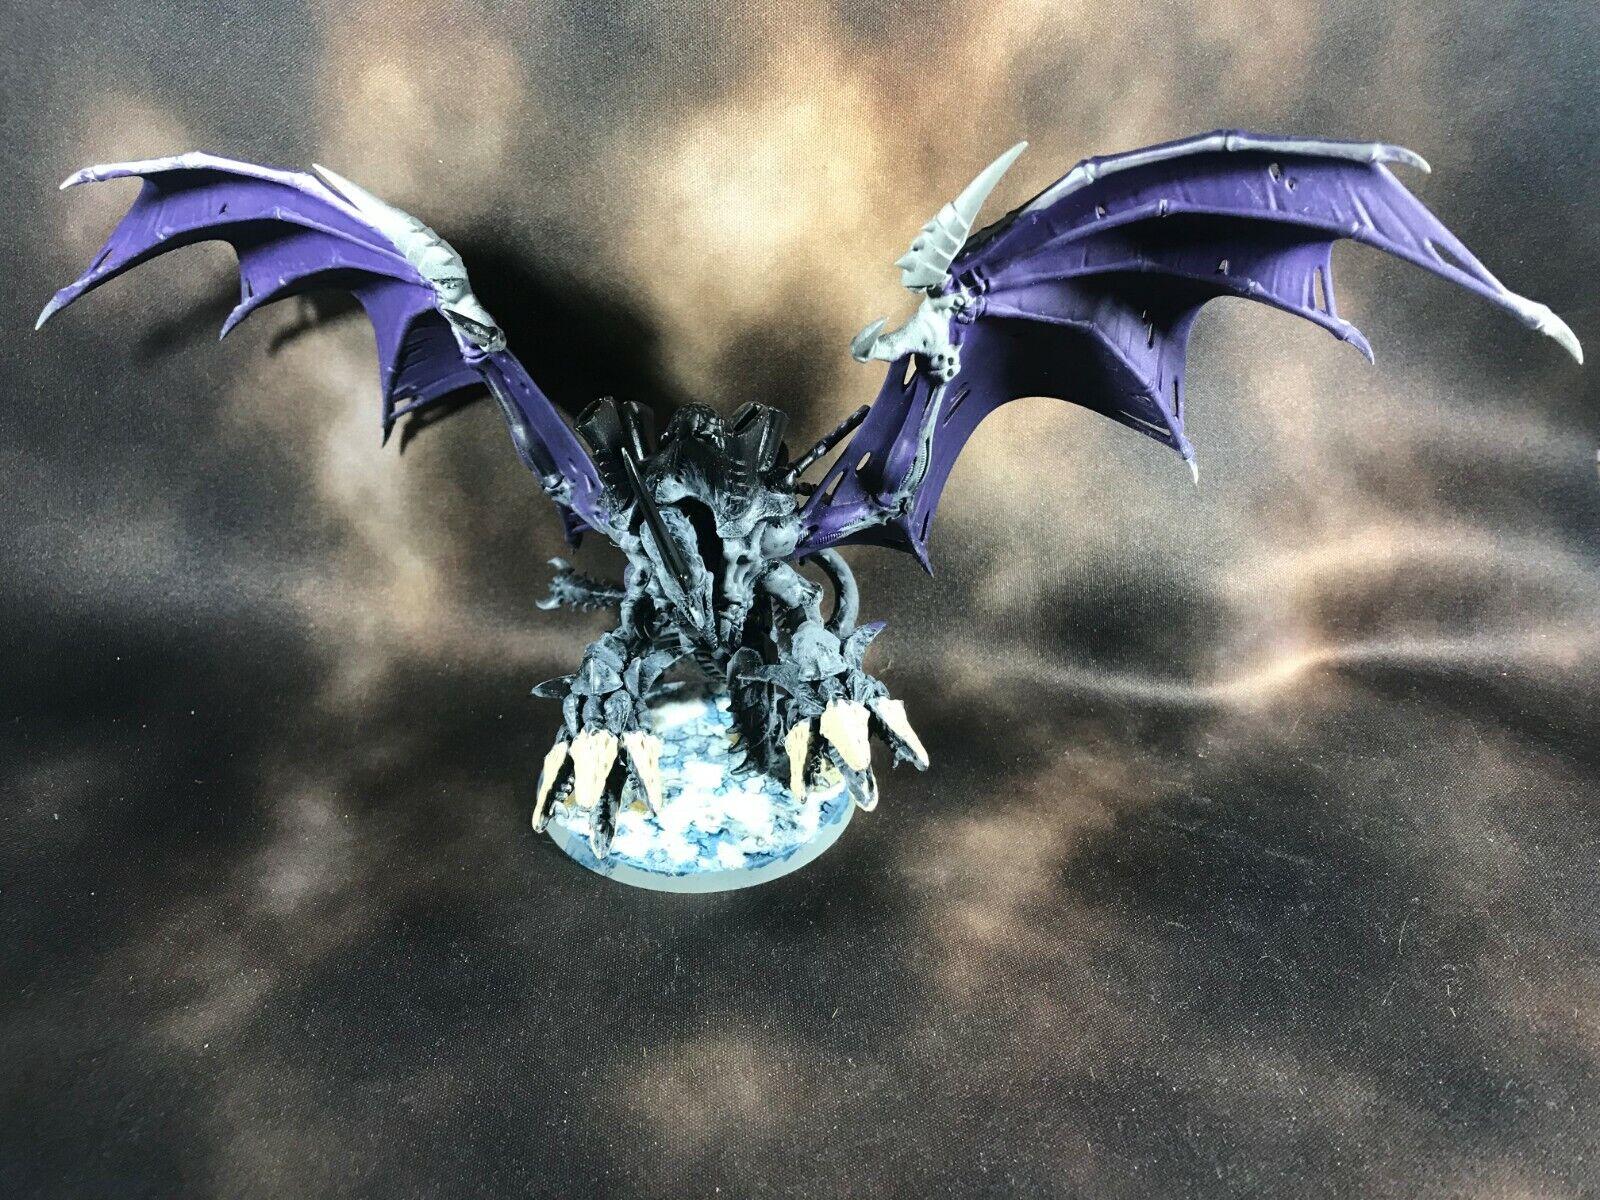 Warhammer 40k Tyranids Genestealer Cult Hive Tyrant Flyrant Devourer